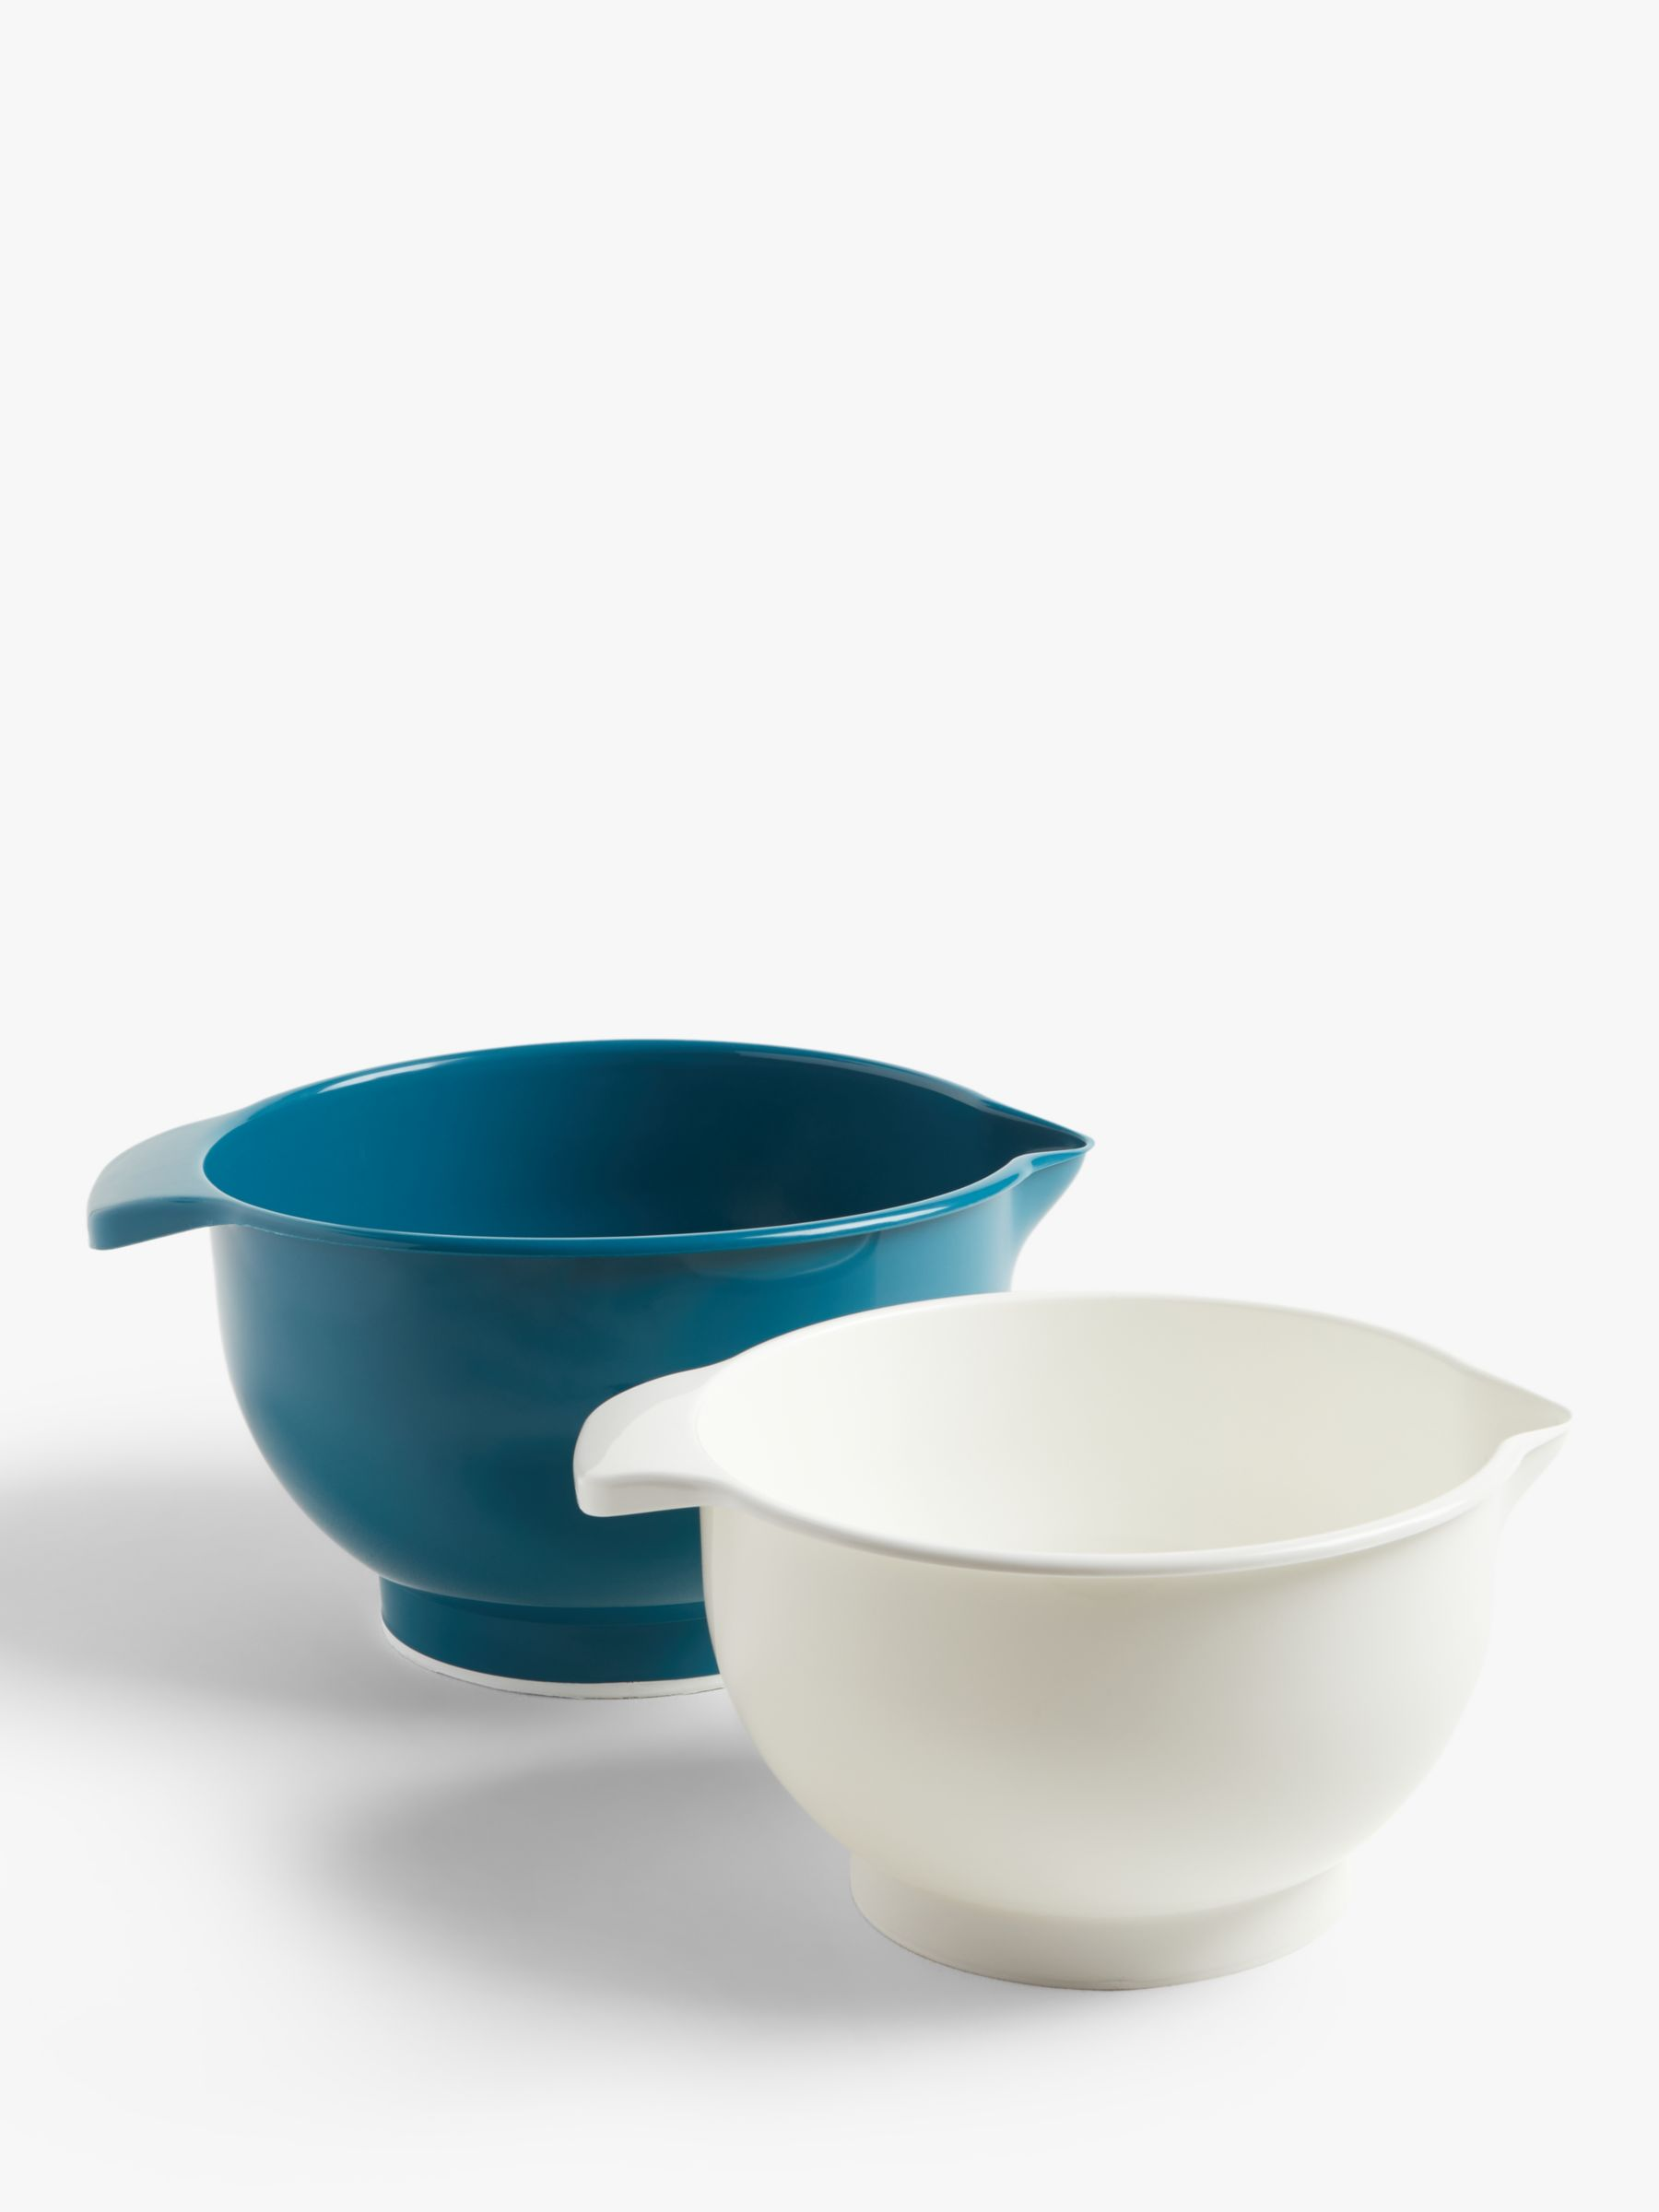 John Lewis & Partners Nesting Mixing Bowls, Set of 2, Teal/White